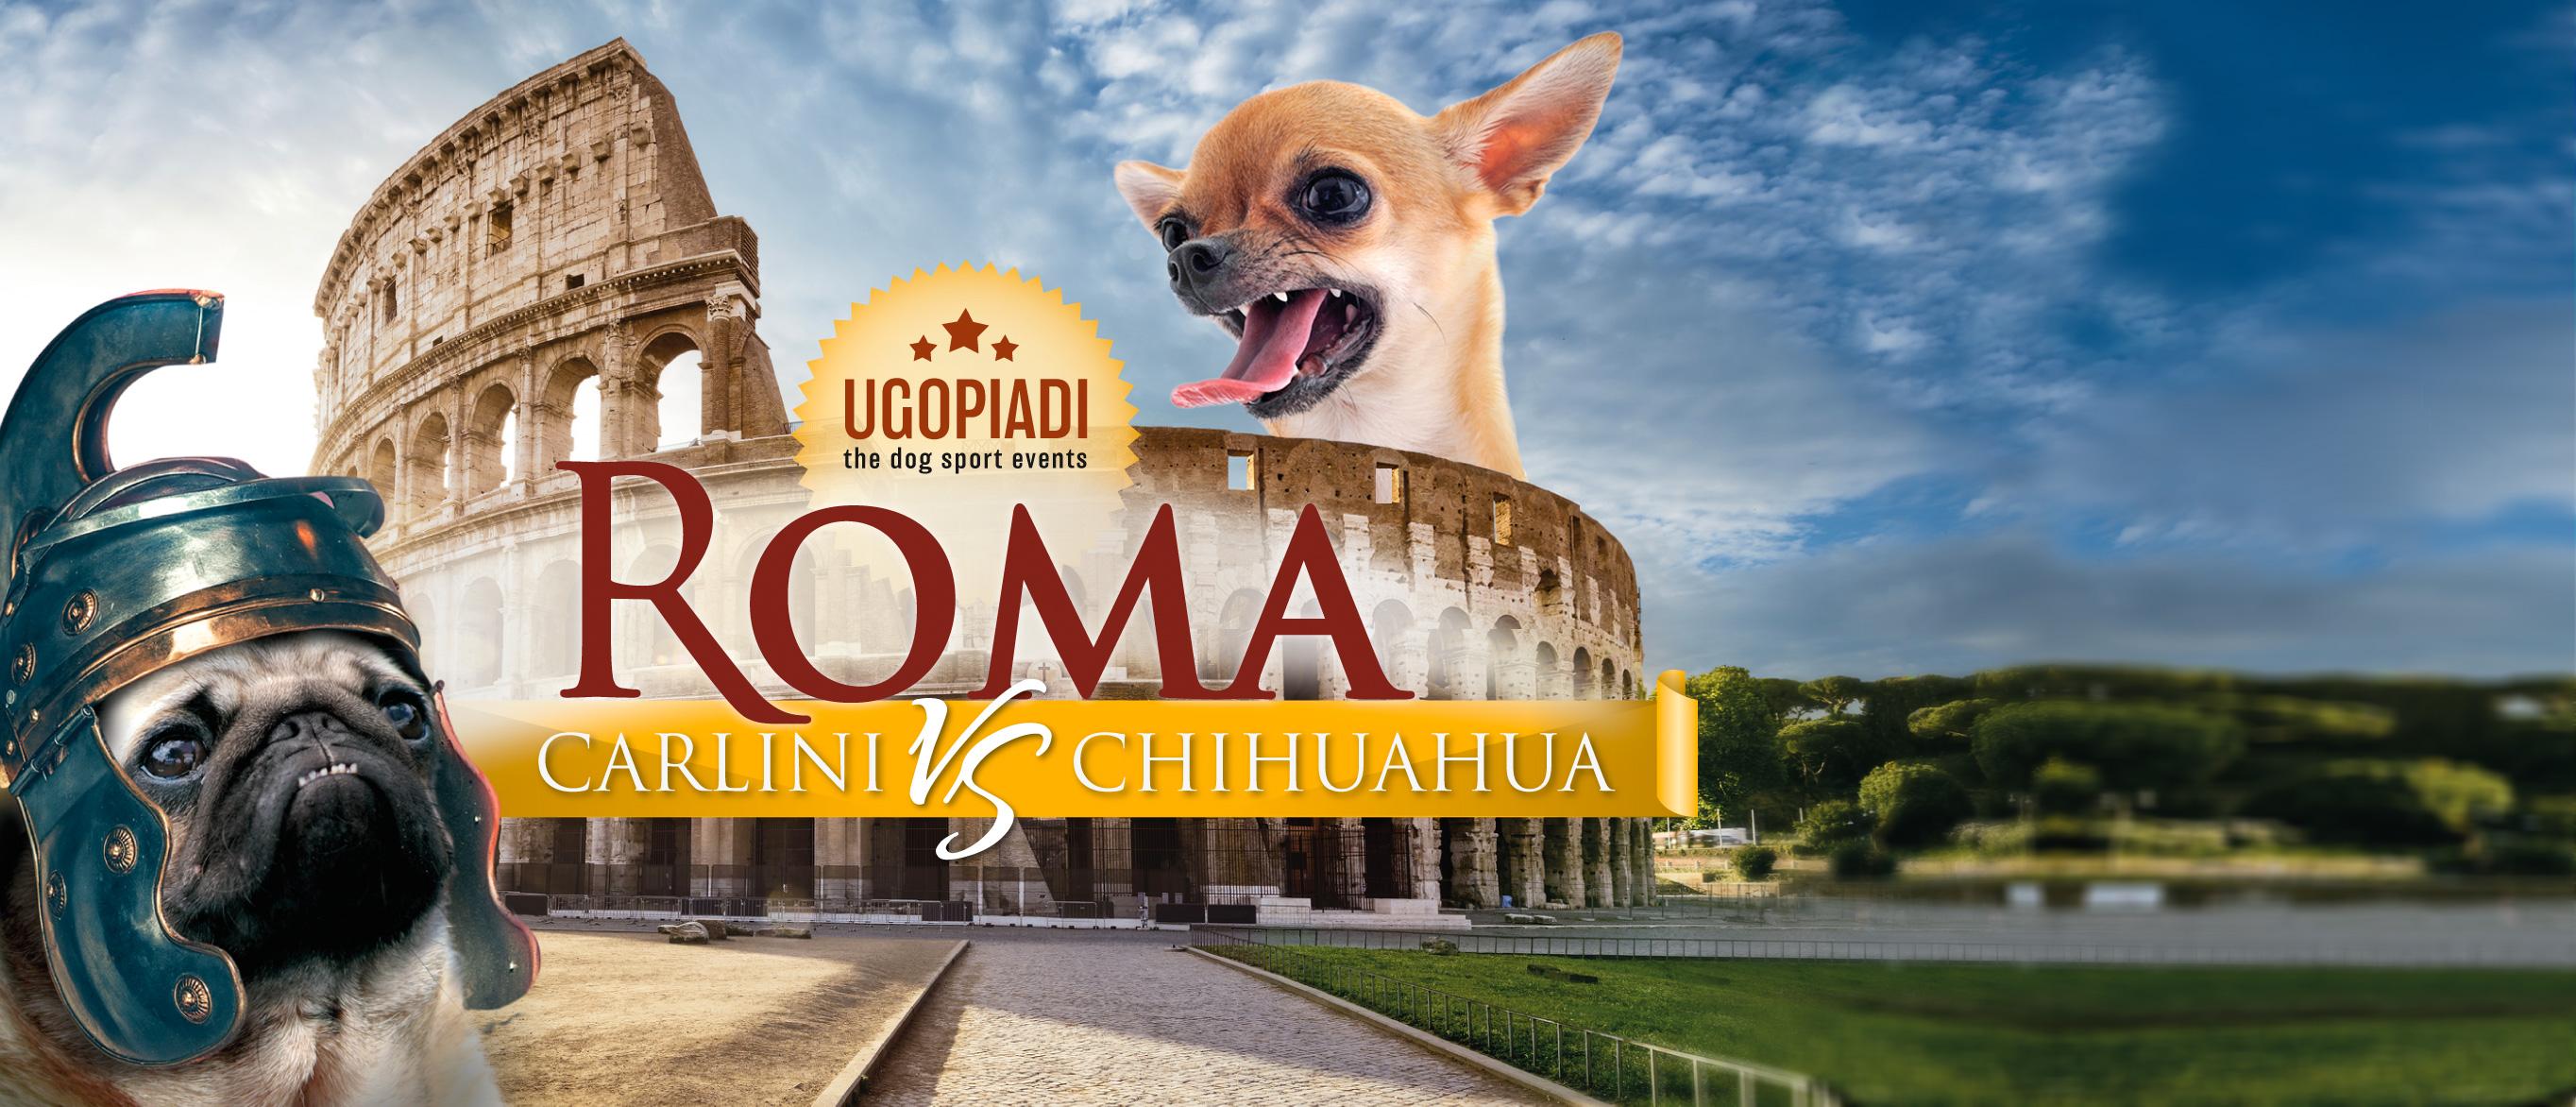 ugopiadi_roma_better